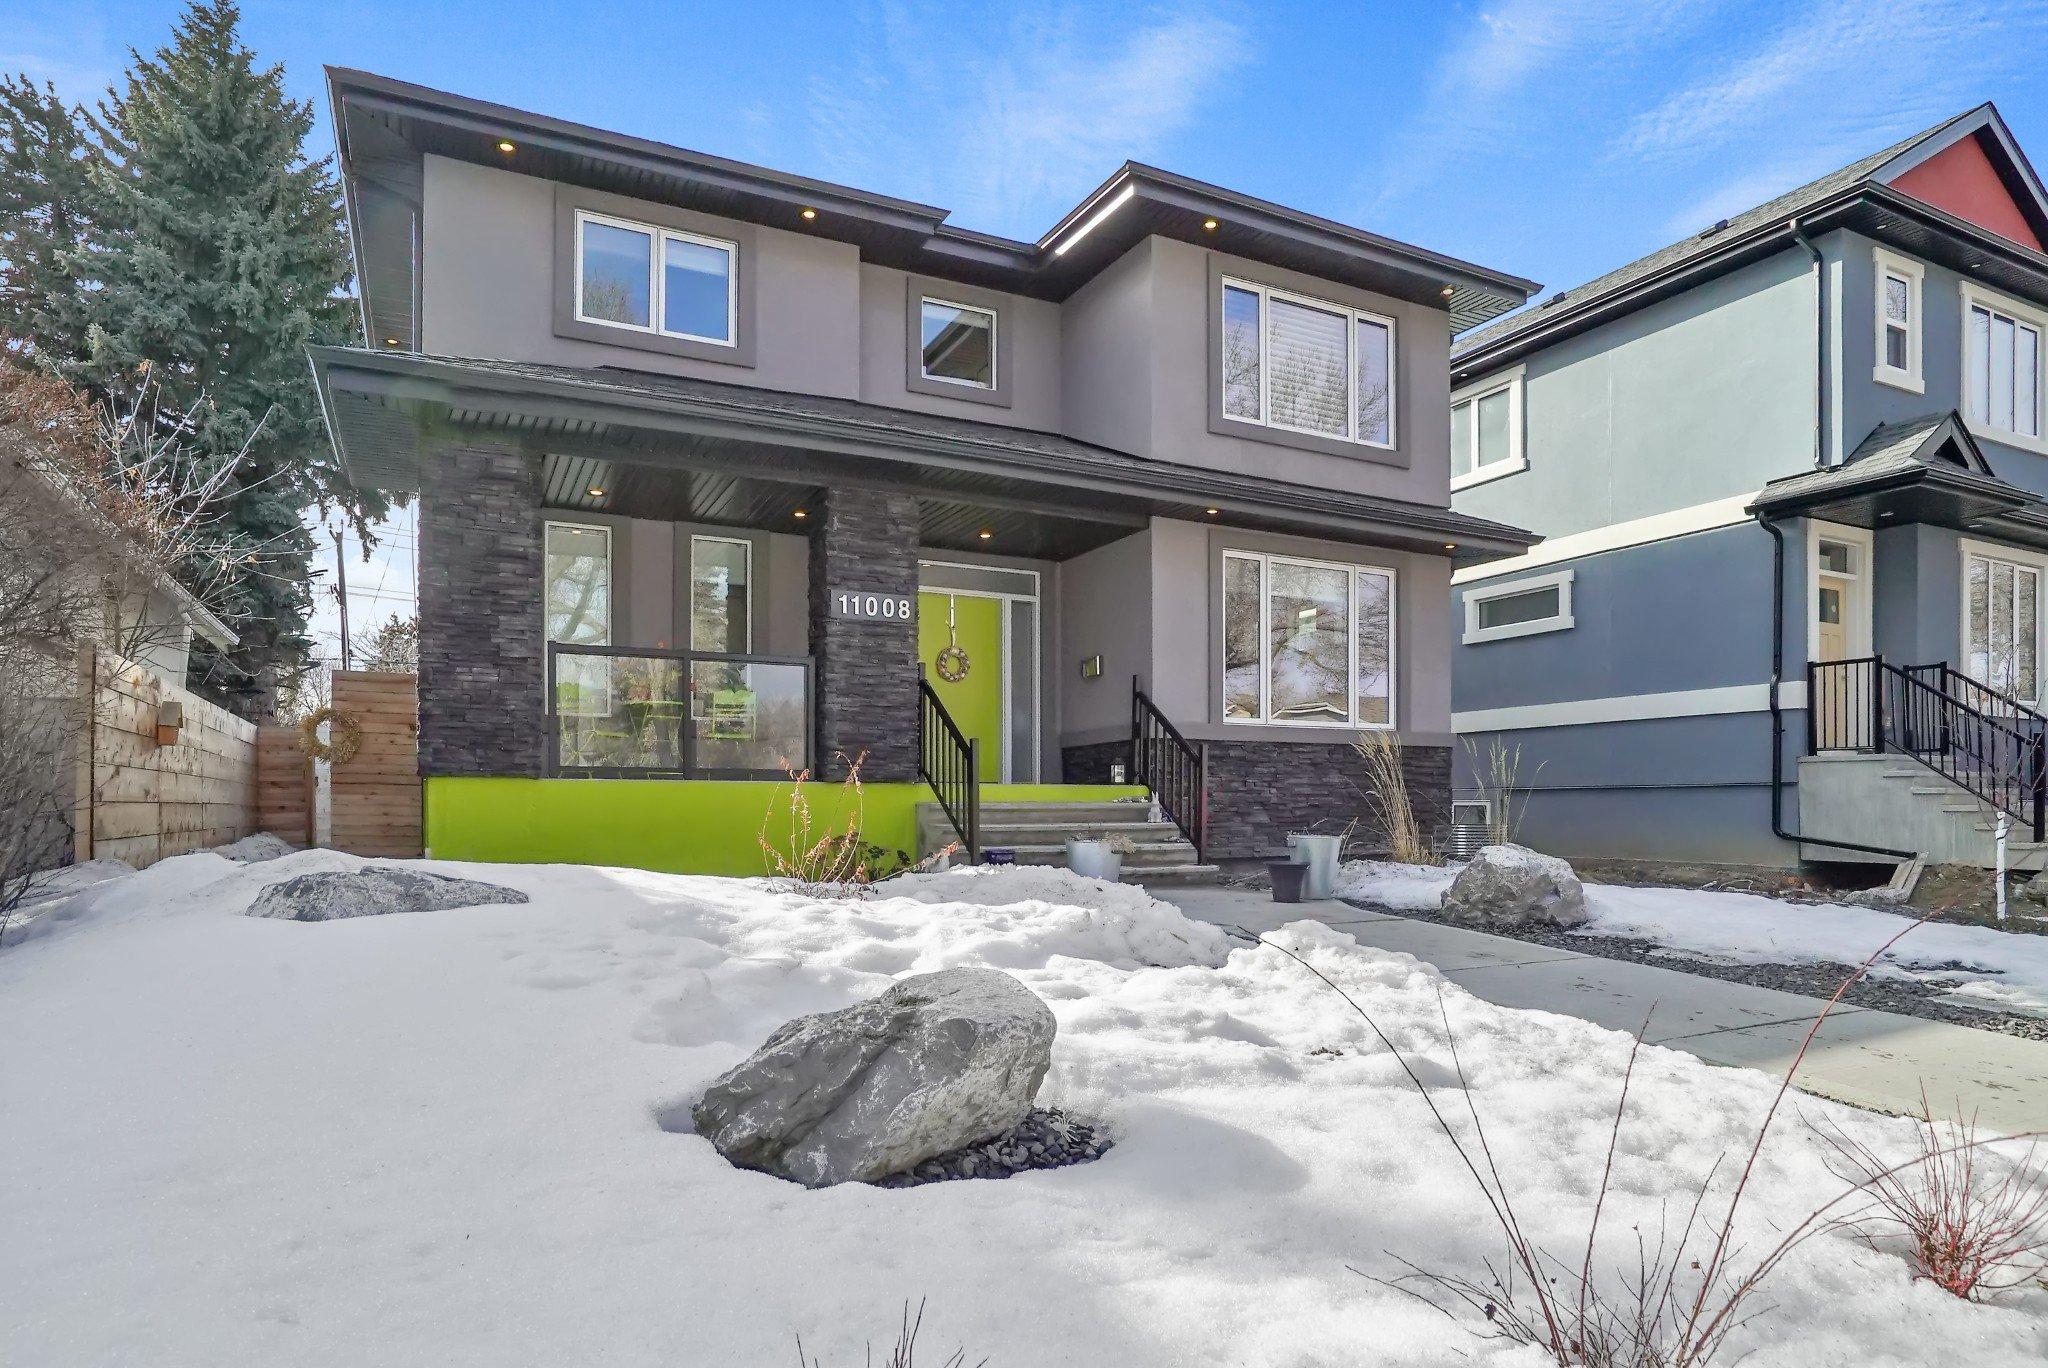 Main Photo: 11008 129 Street NW in : Westmount House for sale (Edmonton)  : MLS®# E4149629